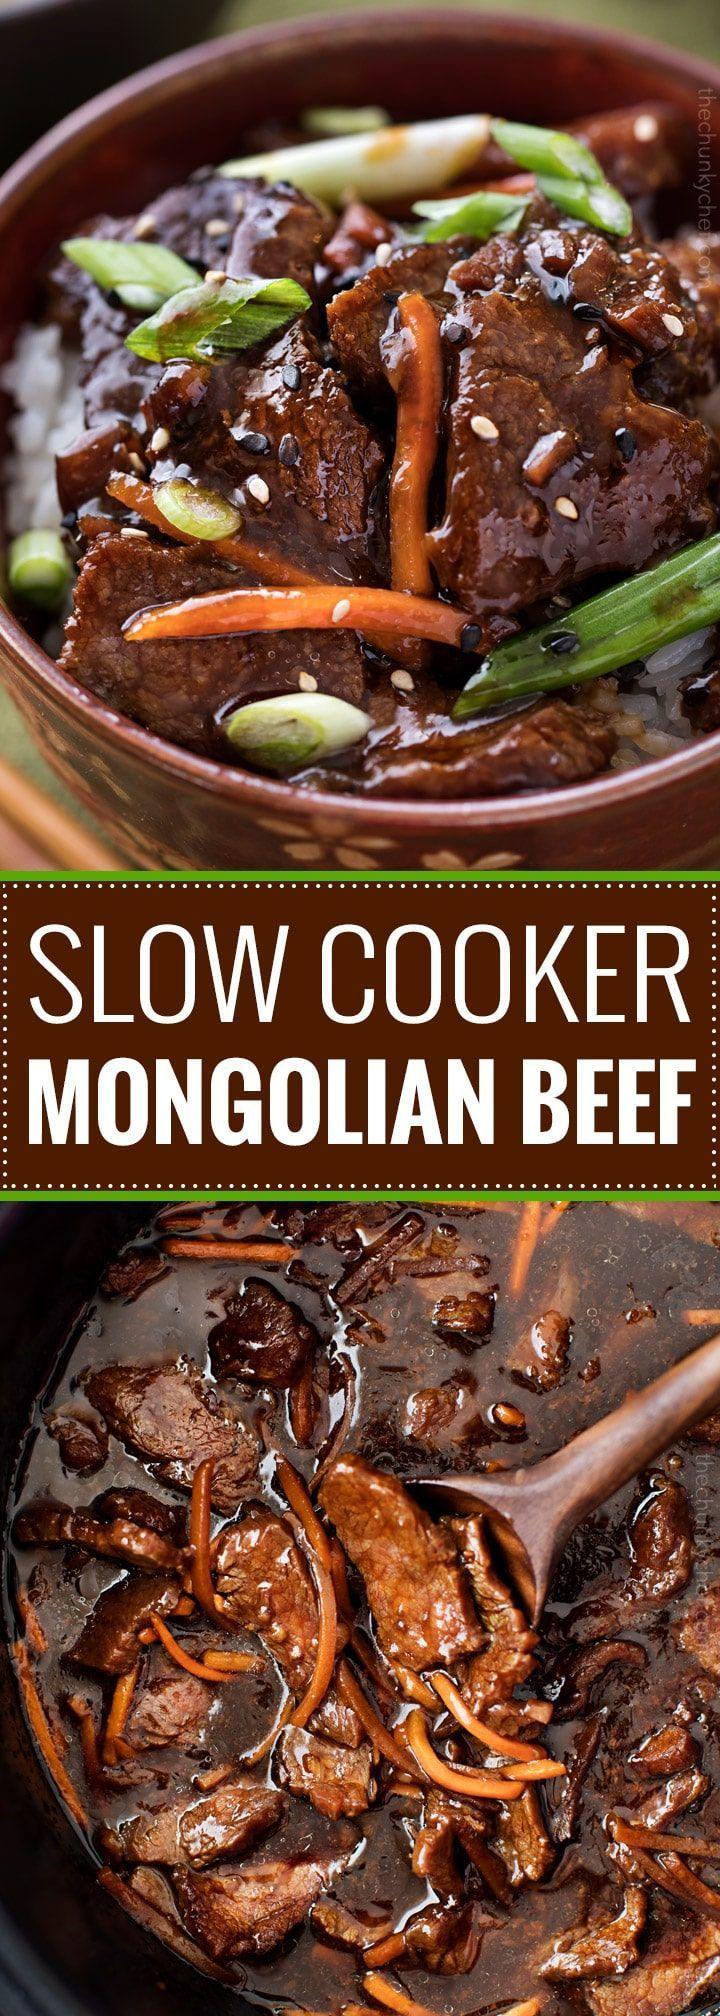 Easy Slow Cooker Mongolian Beef Amazingly Tender Mongolian Beef Made Incredibly Easy In The Sl Slow Cooker Mongolian Beef Recipe Recipes Slow Cooker Recipes